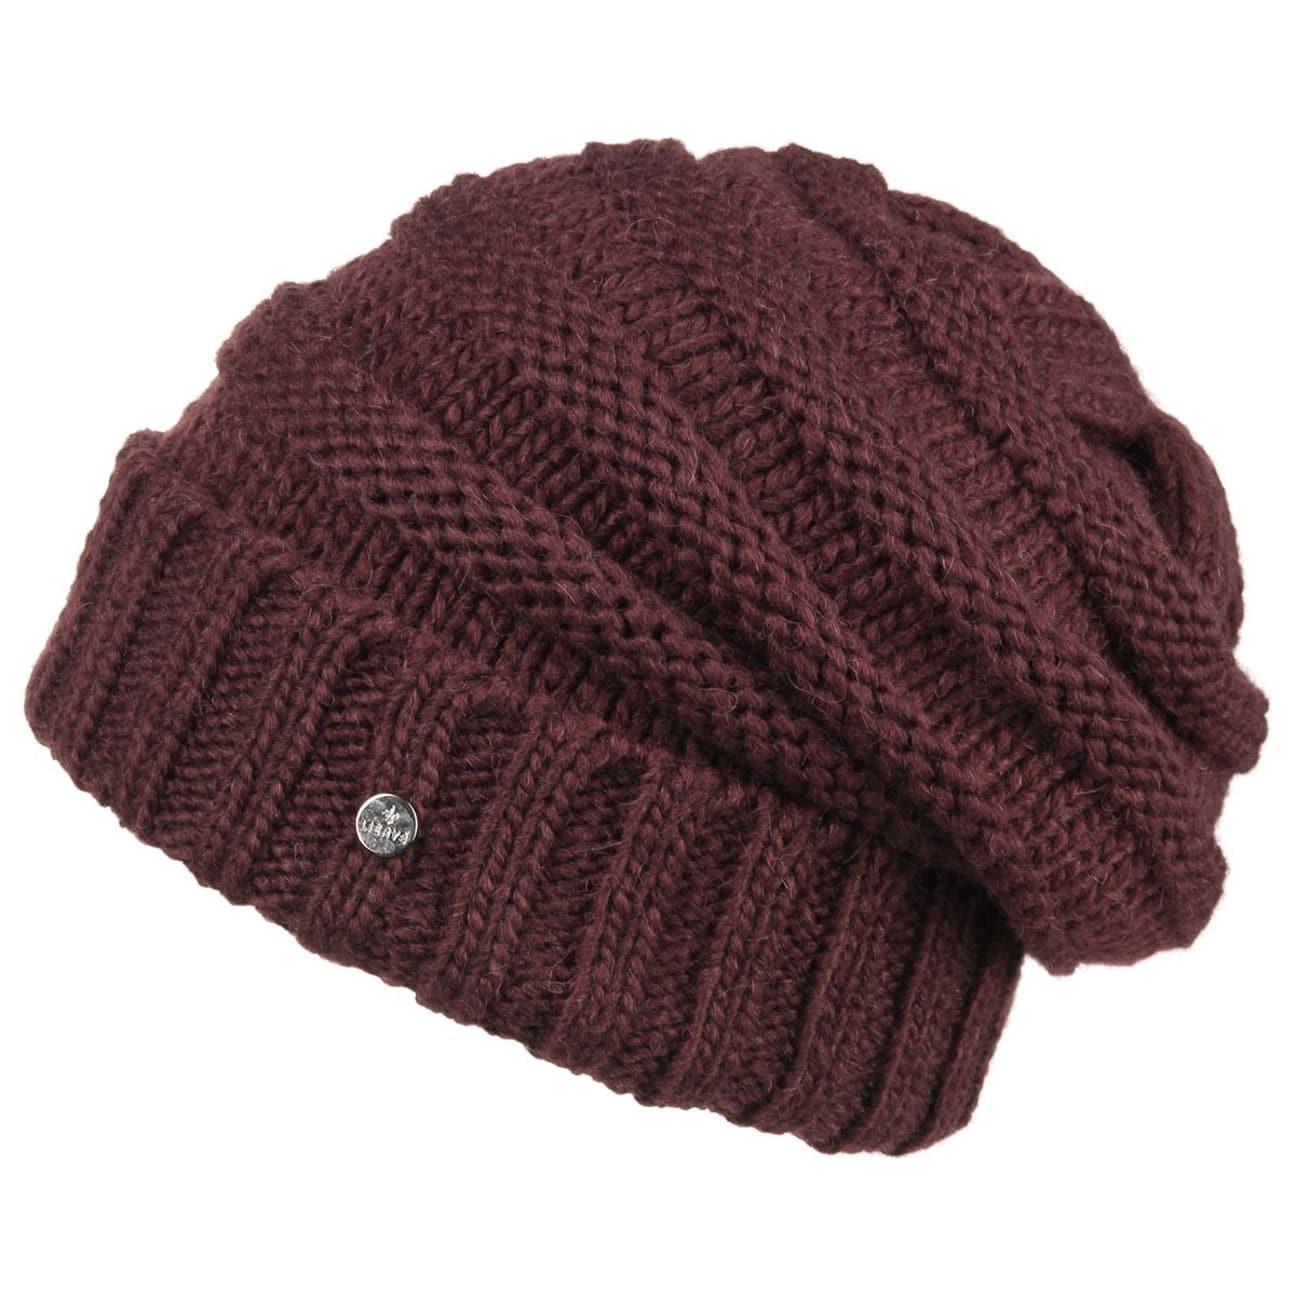 3b9cd509e6b6cc ... Long Beanie Knit Hat by Lierys - black 1 ...